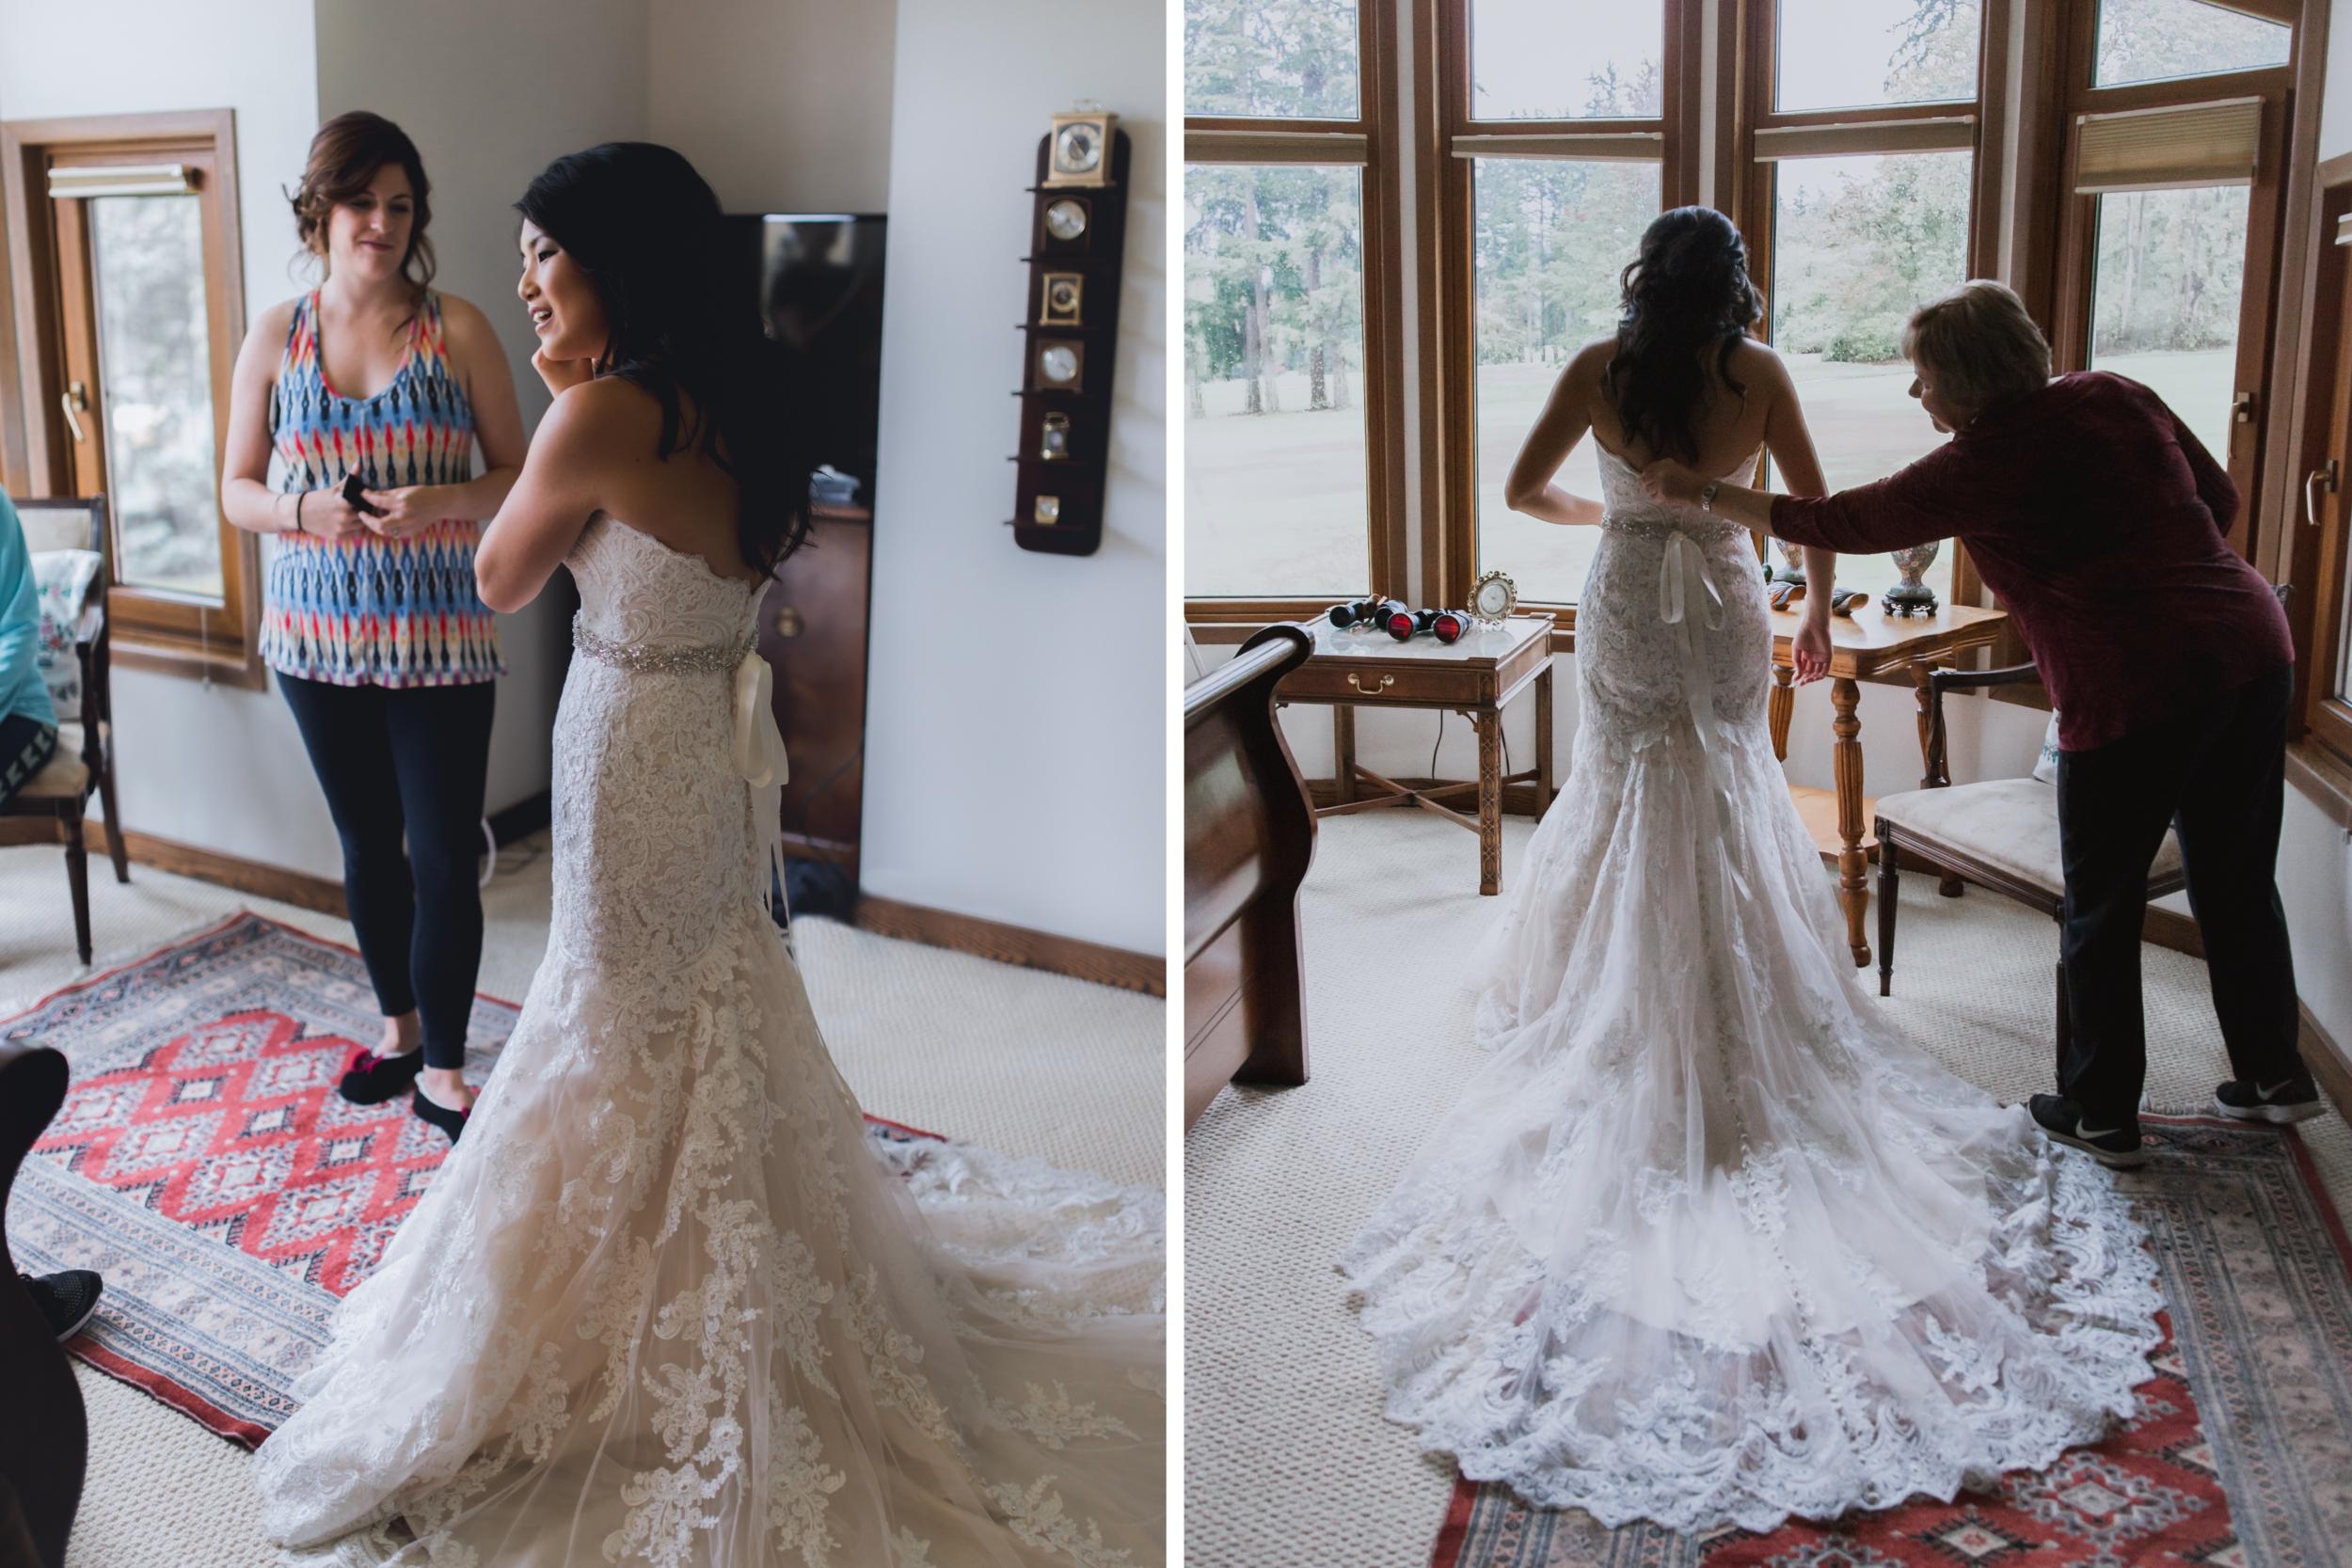 kristin-kevin-wedding-blog-1.jpg